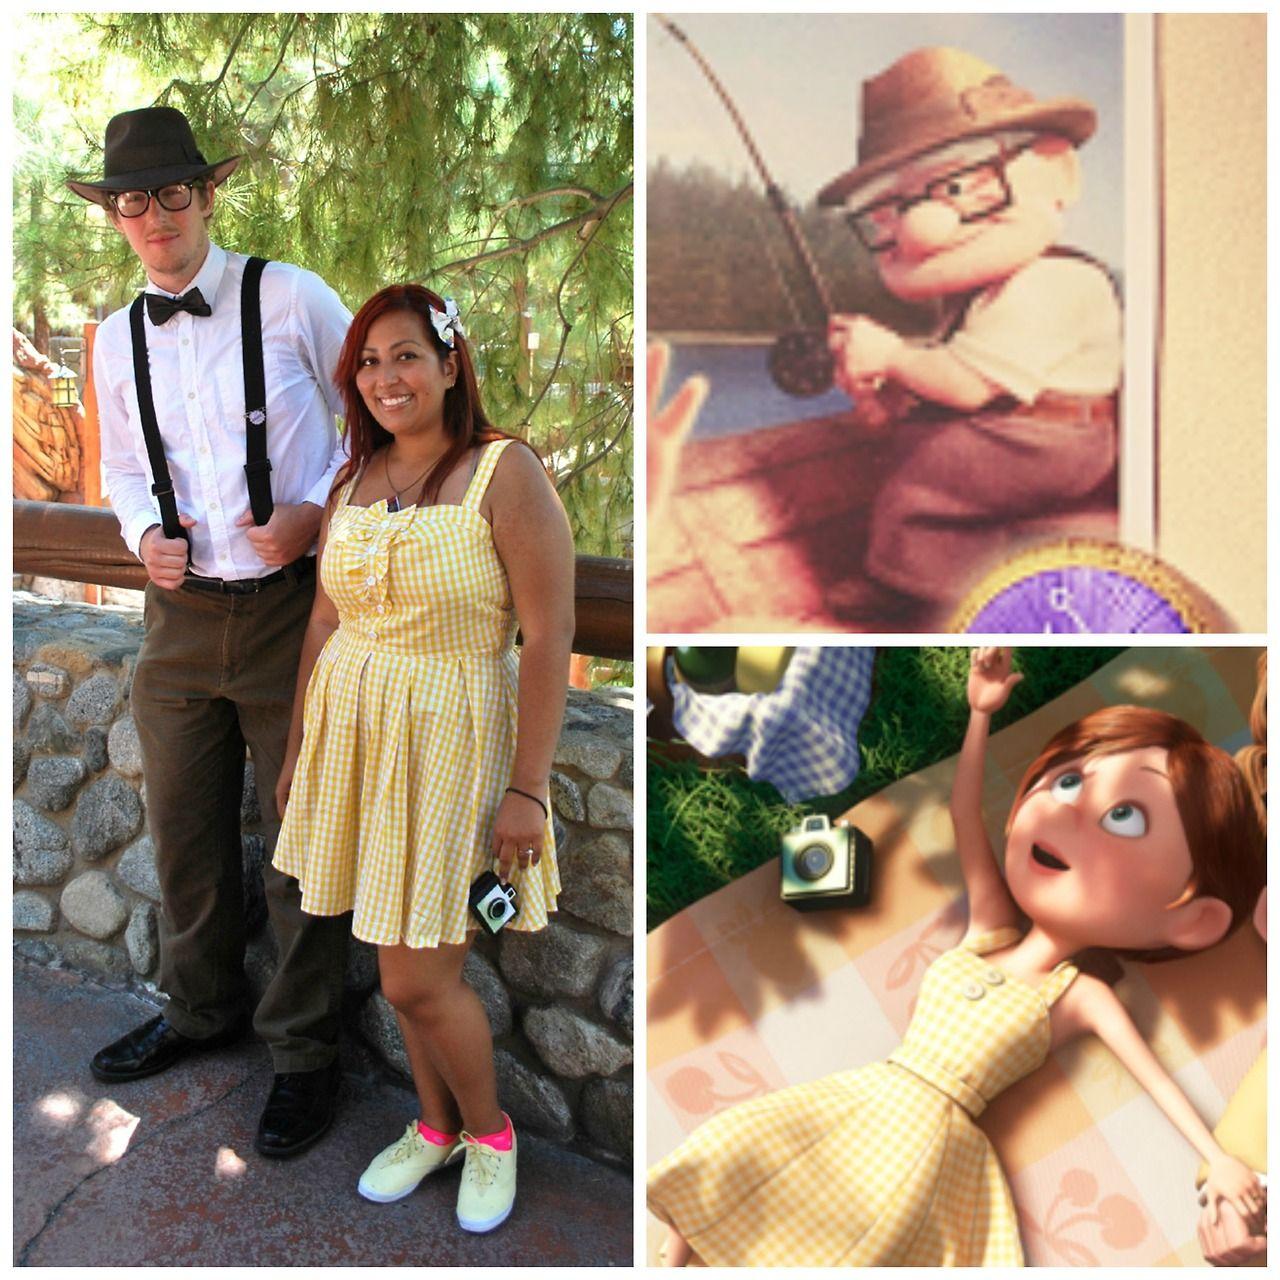 Carl and Ellie Fredrickson | Disney bound outfits, Dapper ...Young Carl And Ellie Disneybound